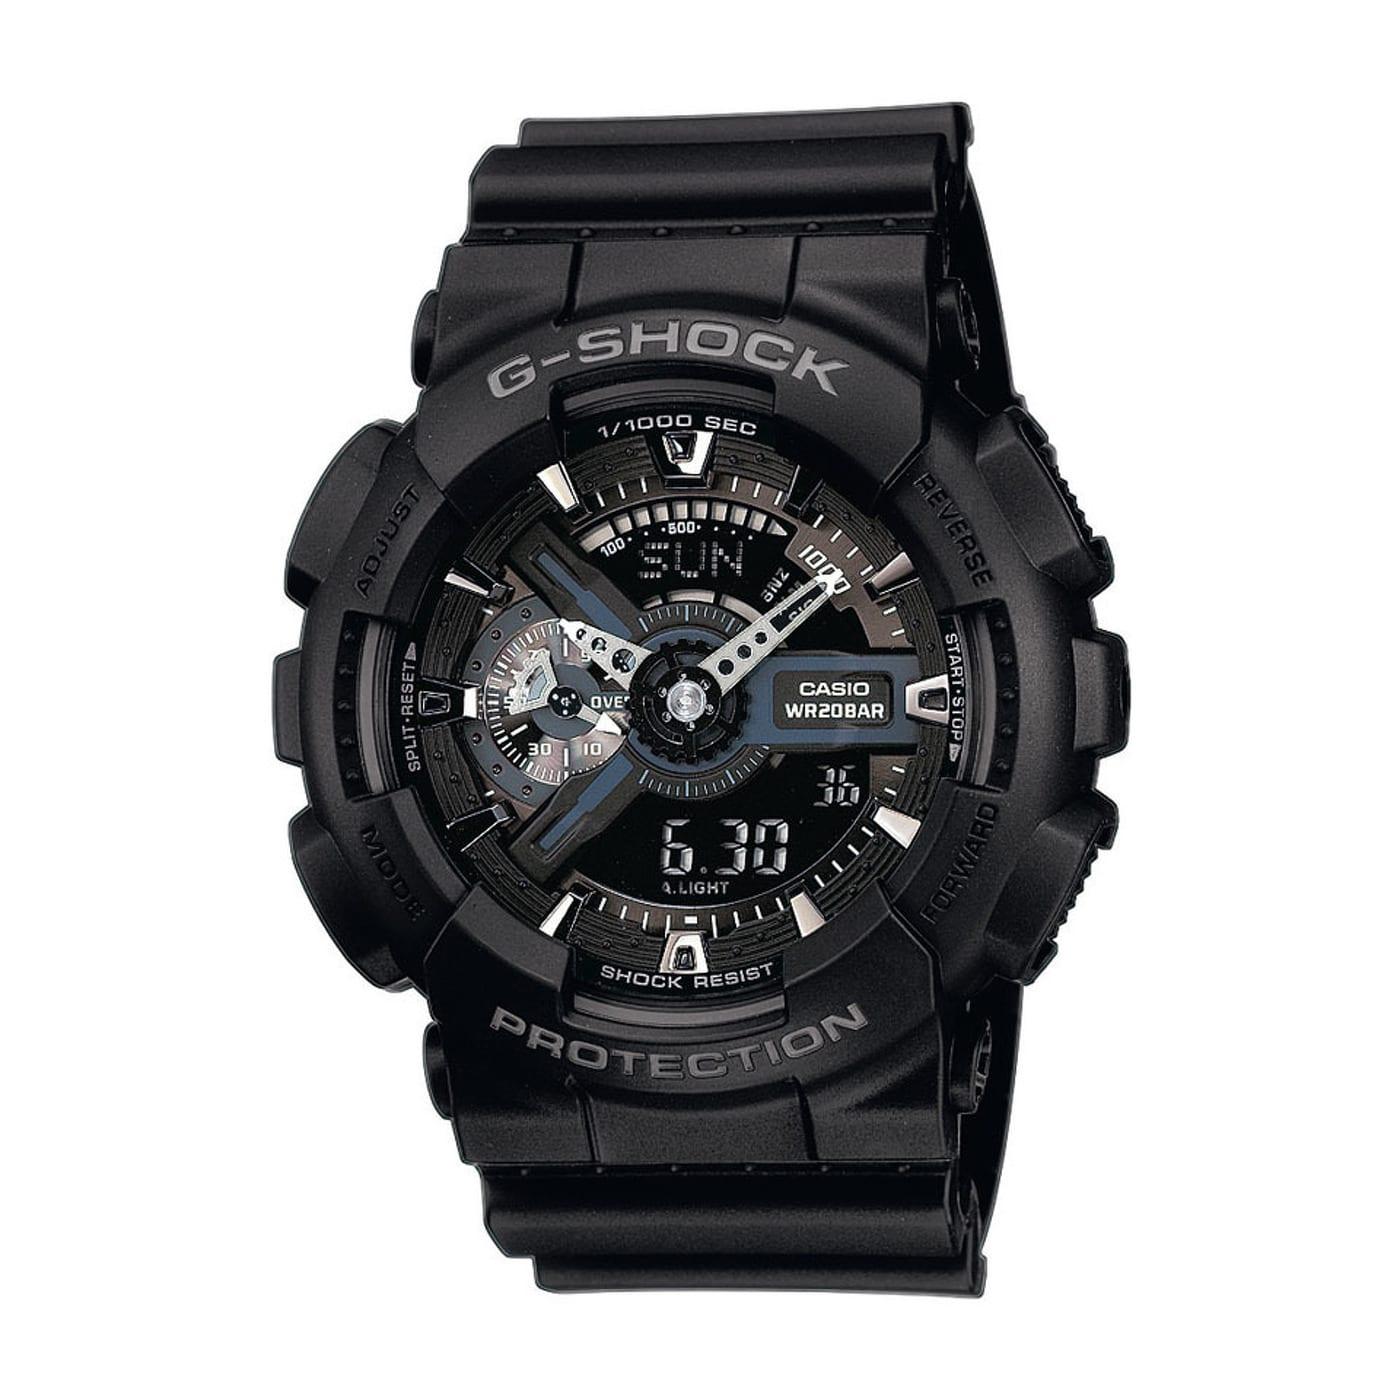 Casio G-Shock GA 110-1BER black